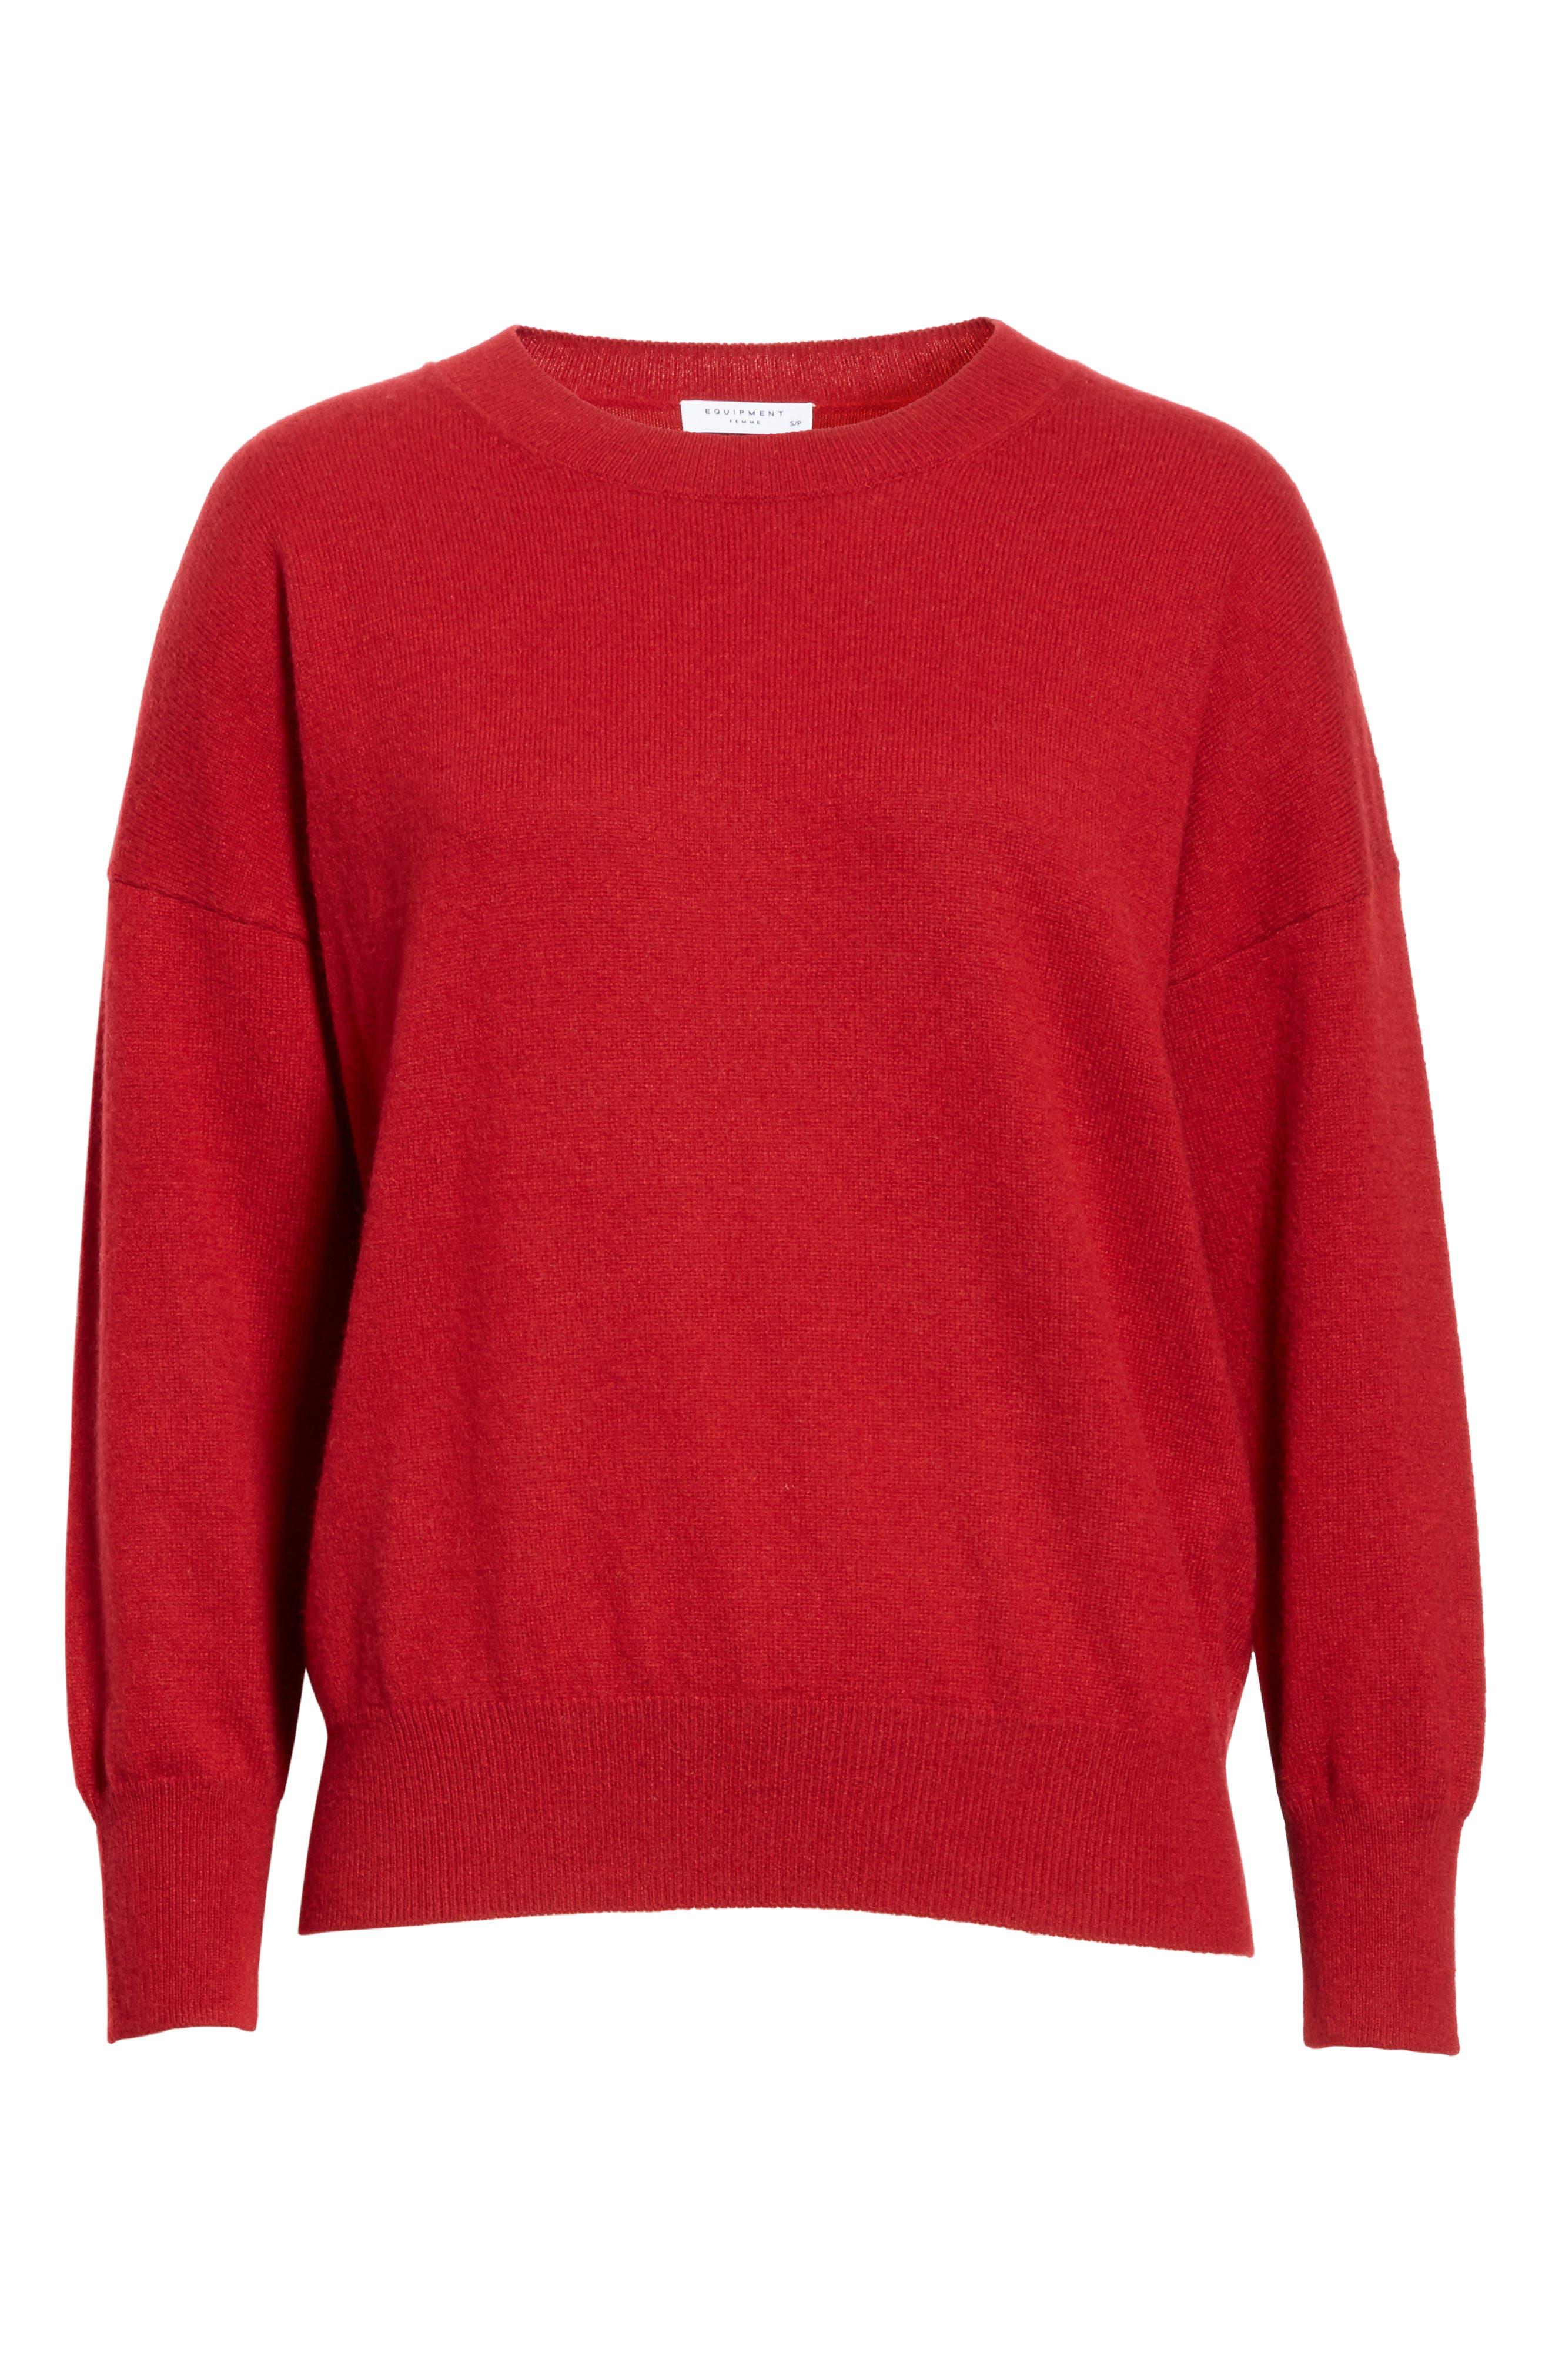 Melanie Cashmere Sweater,                             Alternate thumbnail 6, color,                             Rhubarb